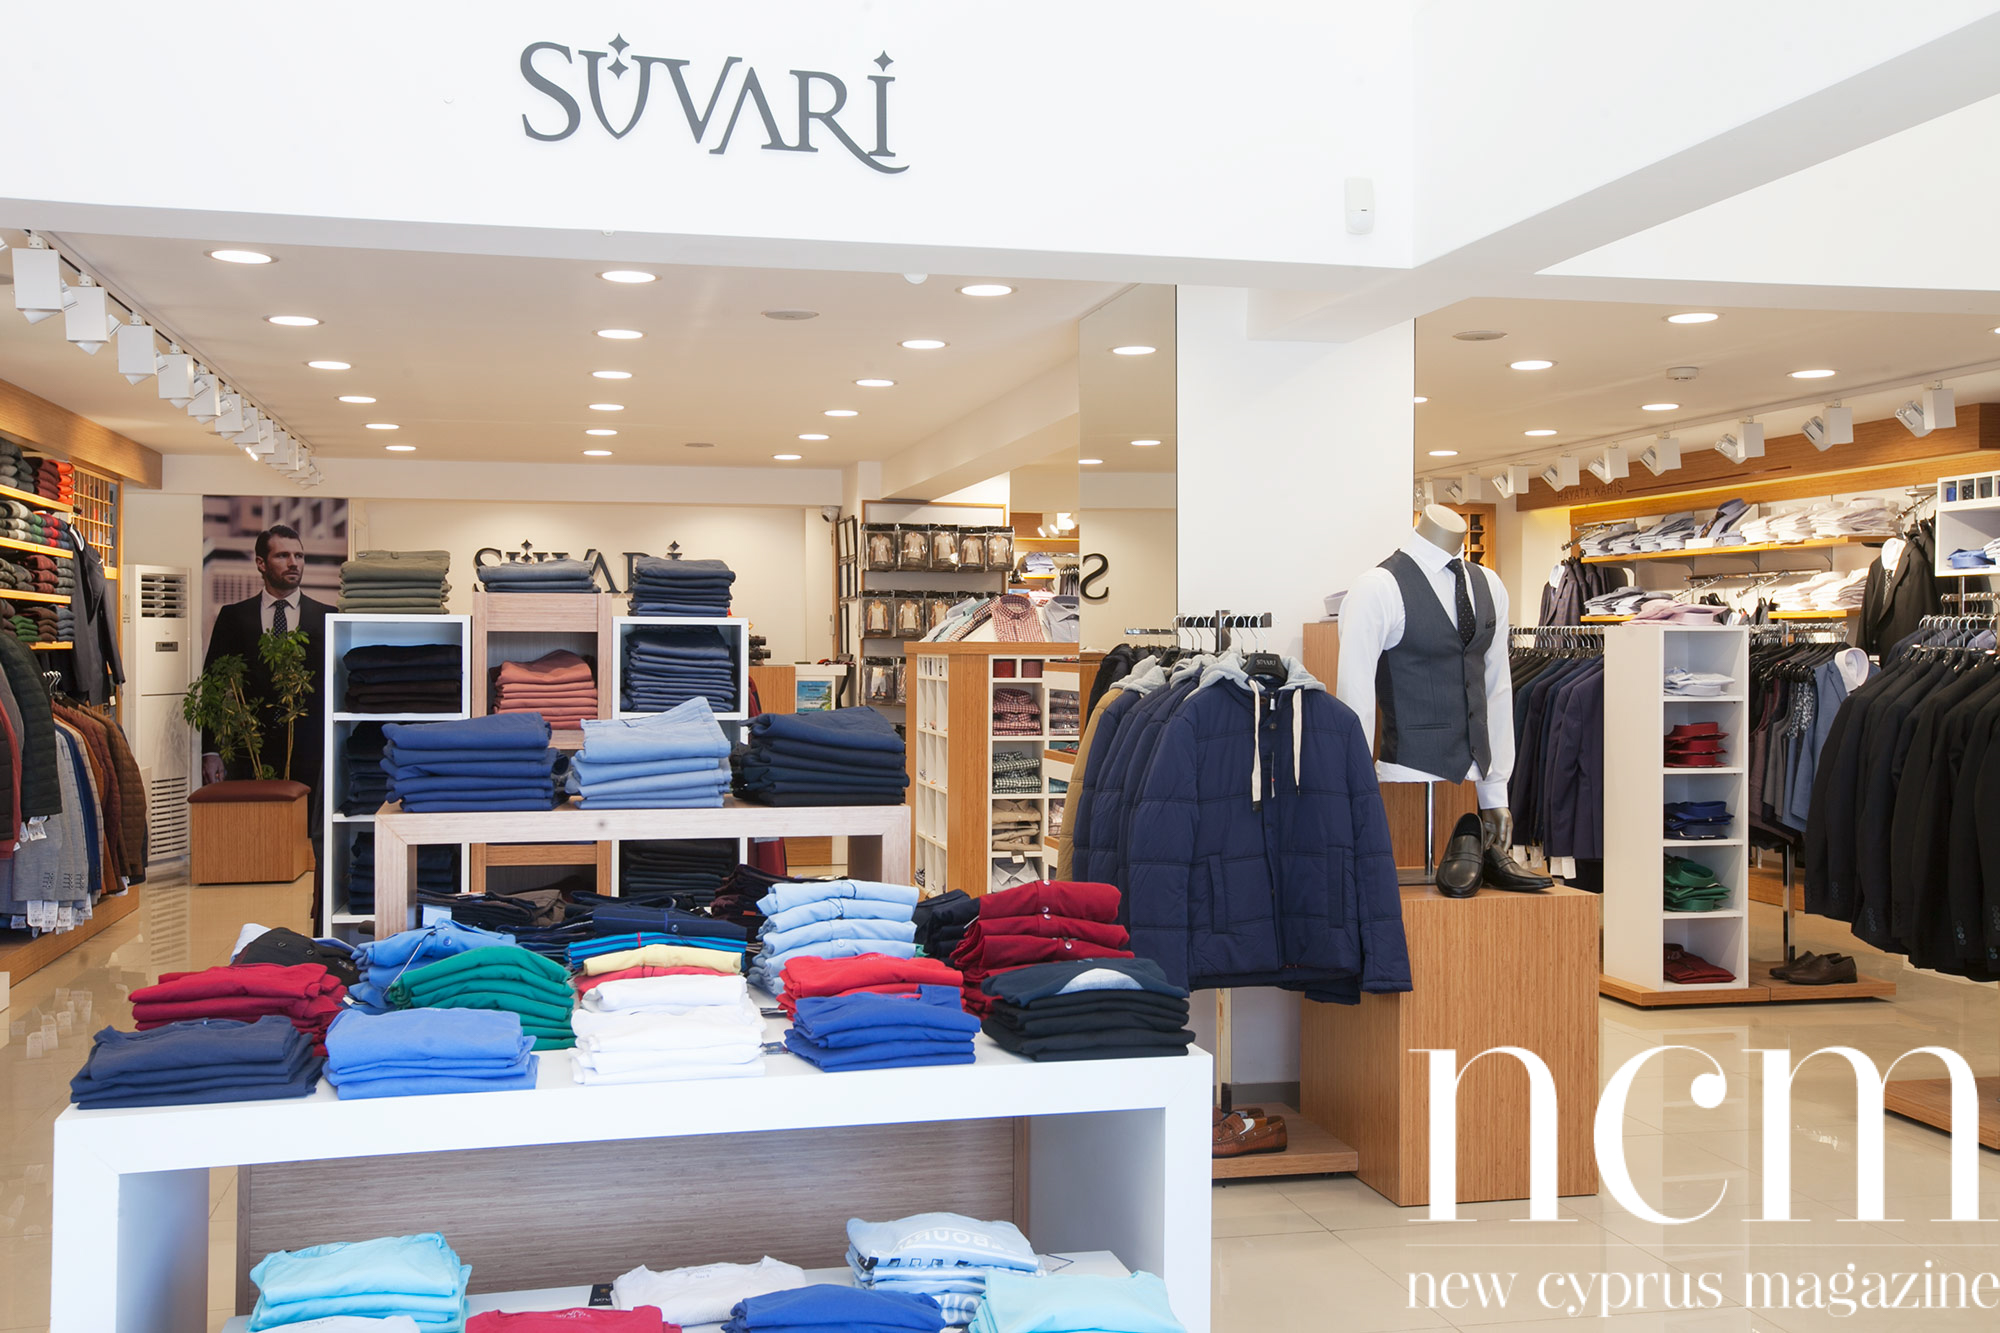 Süvari gentlemen cloths and suits in Kyrenia and Nicosia